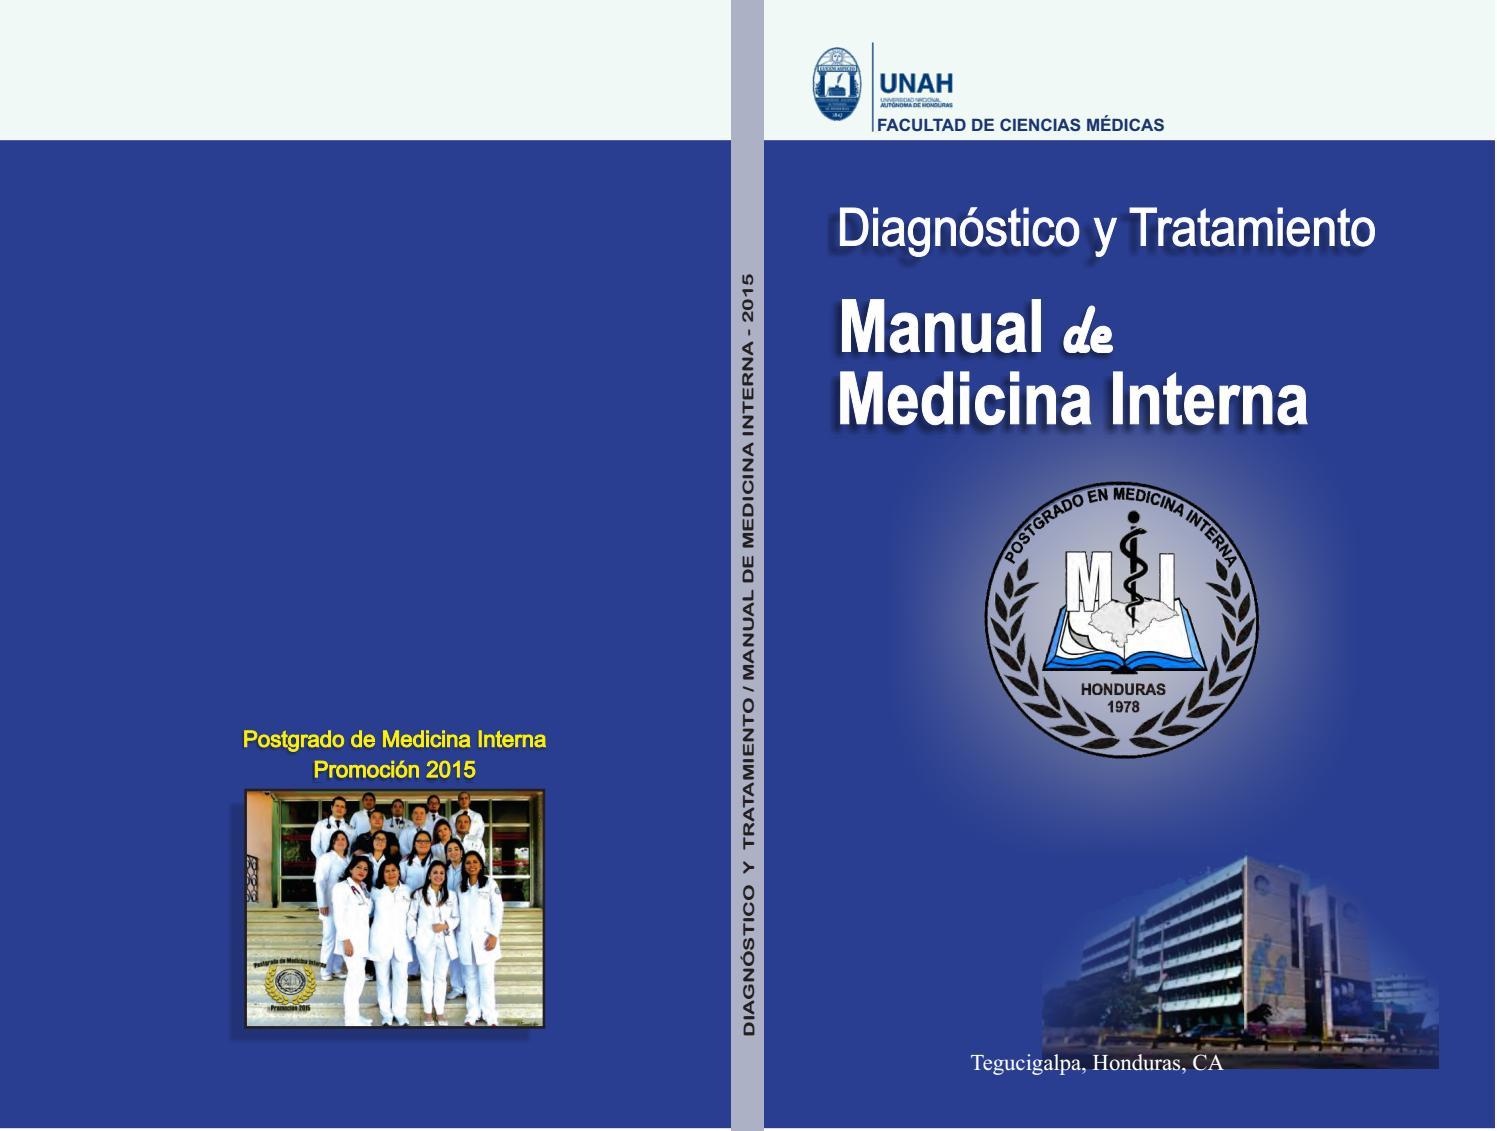 diagnóstico de estomatocitosis hereditaria de diabetes